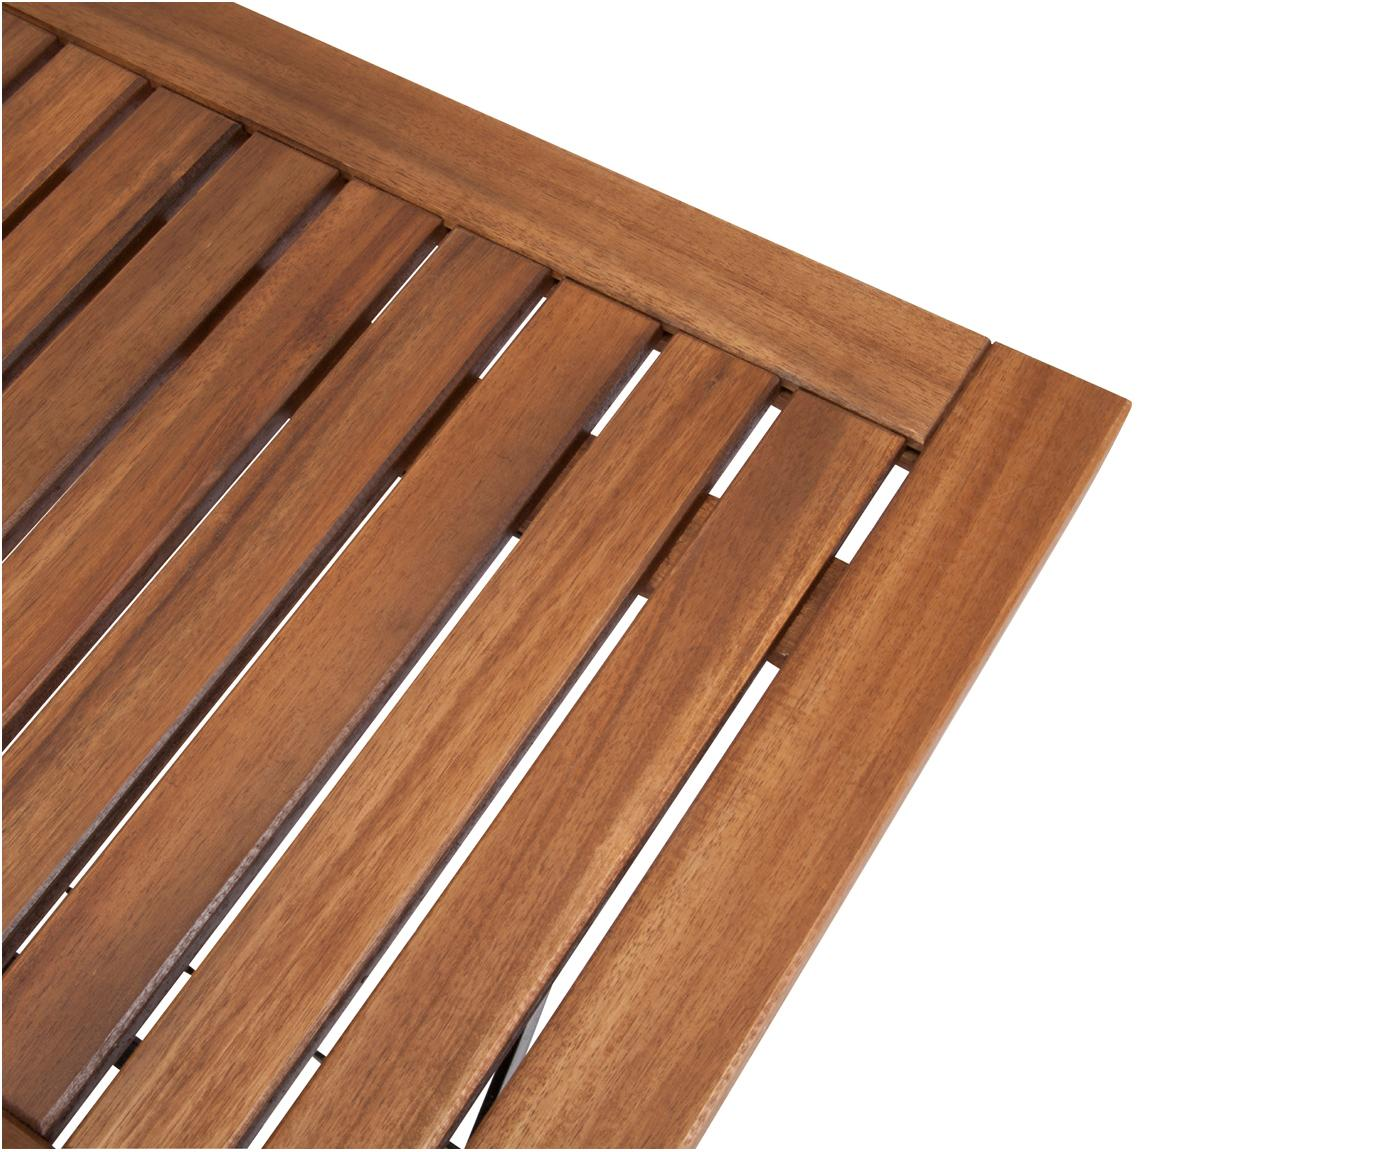 Klaptafel Parklife, Tafelblad: geolied acaciahout,, Frame: verzinkt en gepoedercoat , Zwart, acaciahoutkleurig, 80 x 75 cm